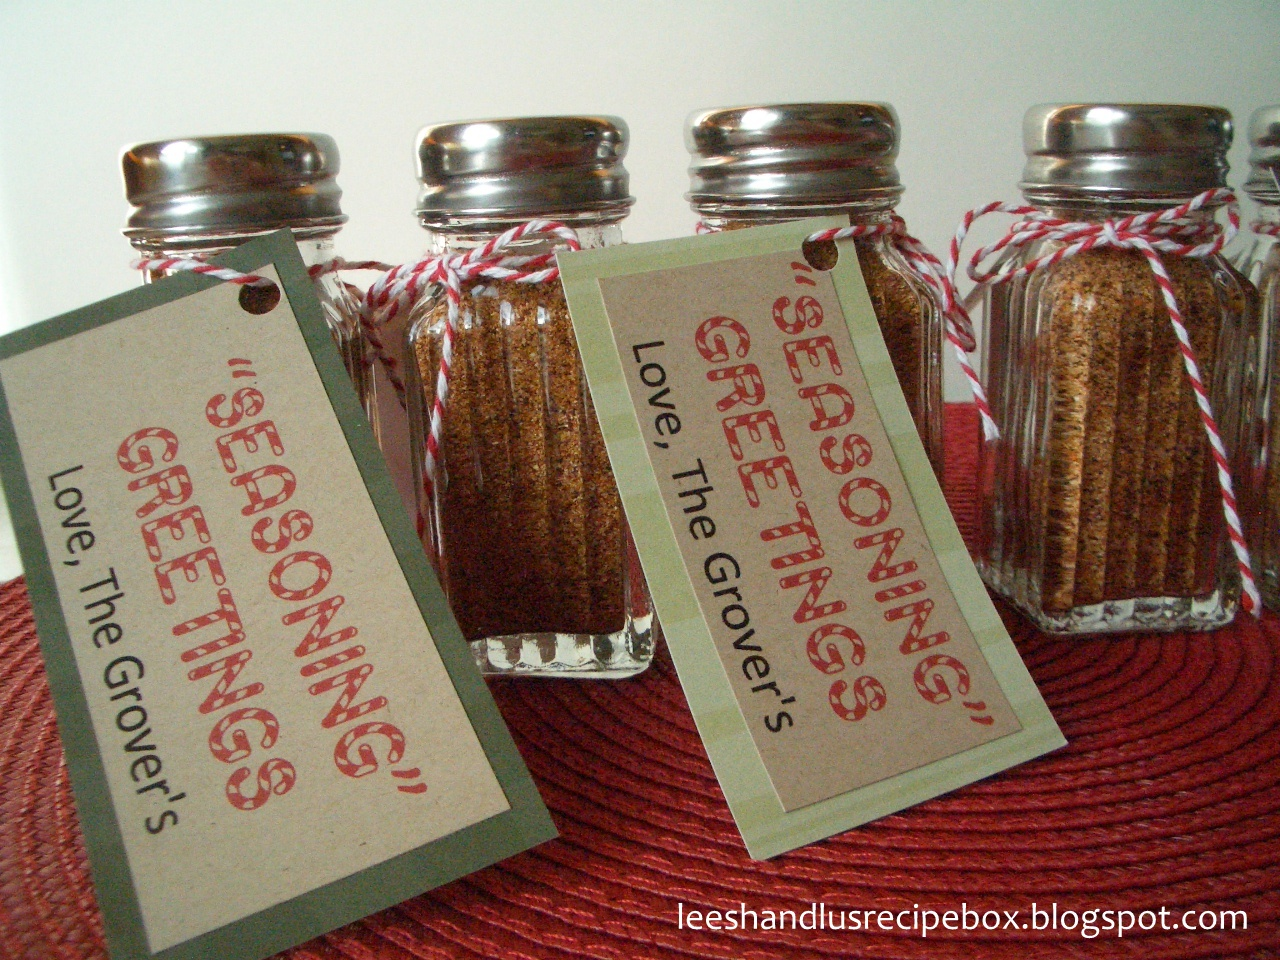 Neighbor Christmas Gift Ideas - Eighteen25